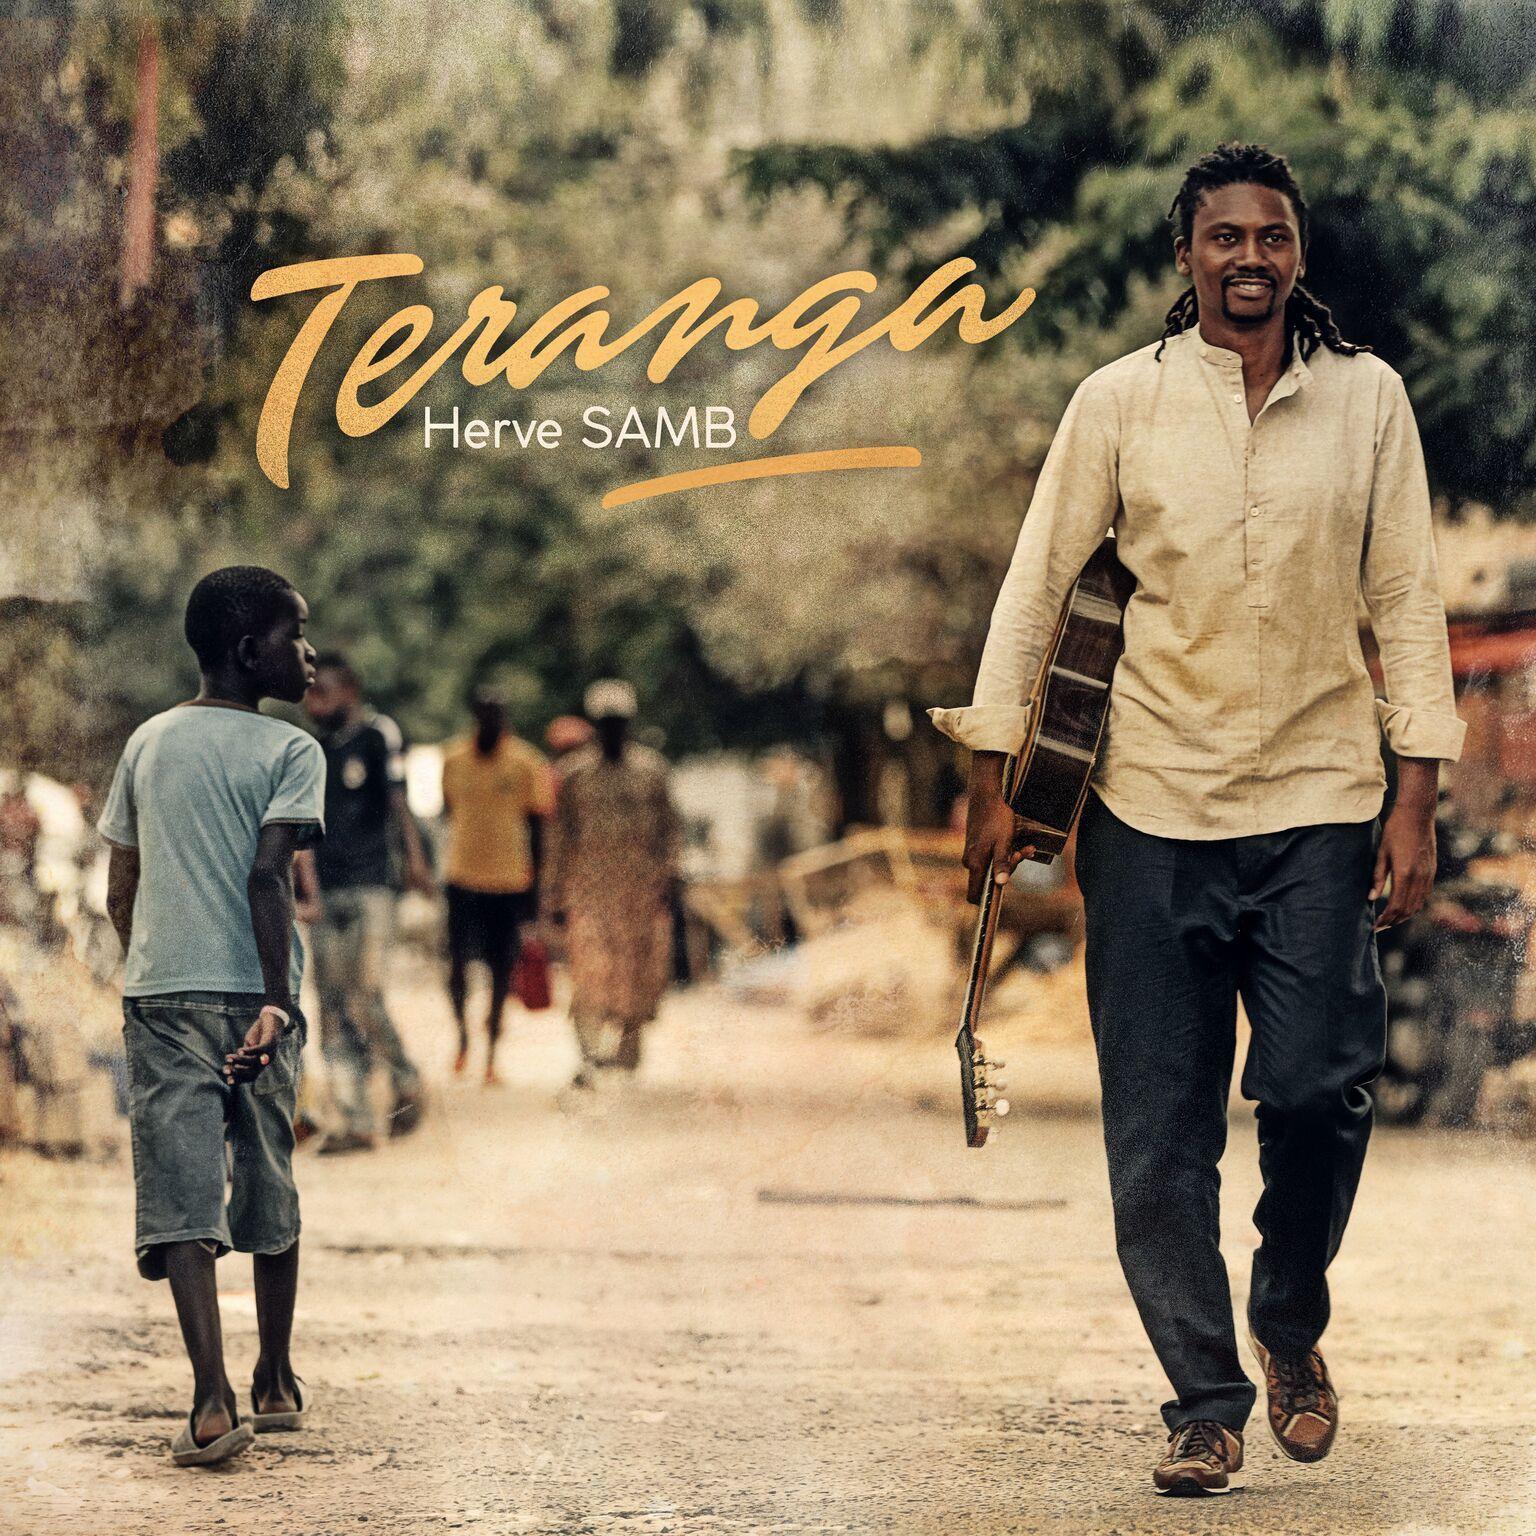 Teranga / Herve Samb